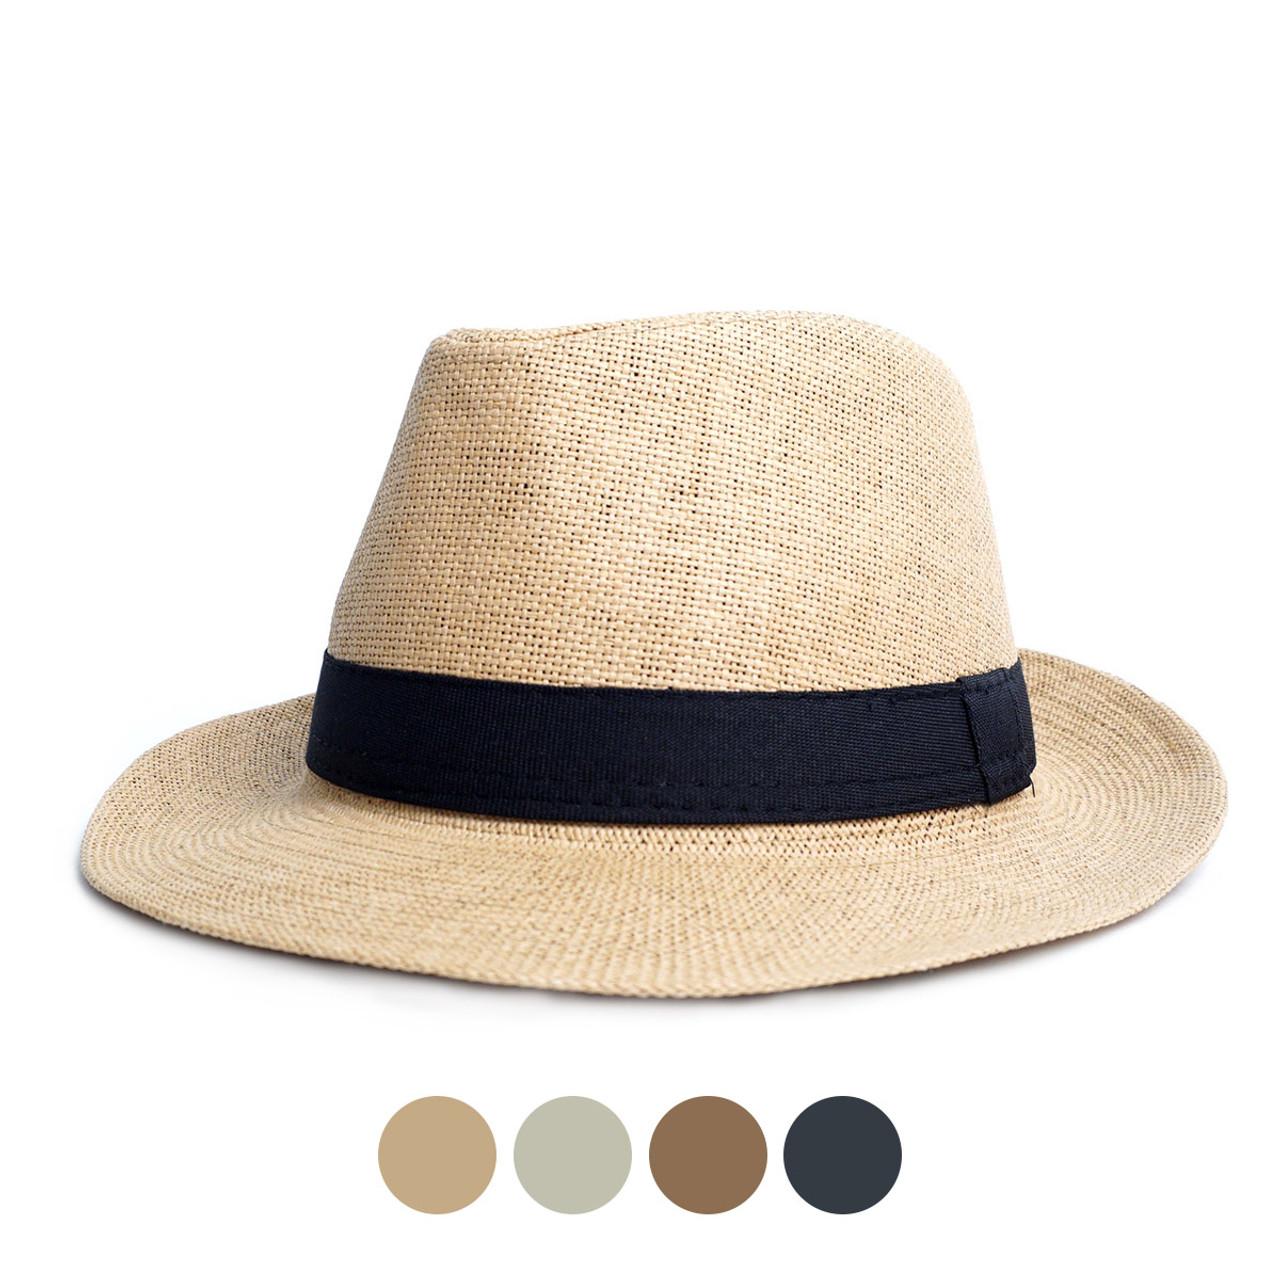 88a71445ef7ec Spring Summer Wide Brim Fedora Hat - H180601